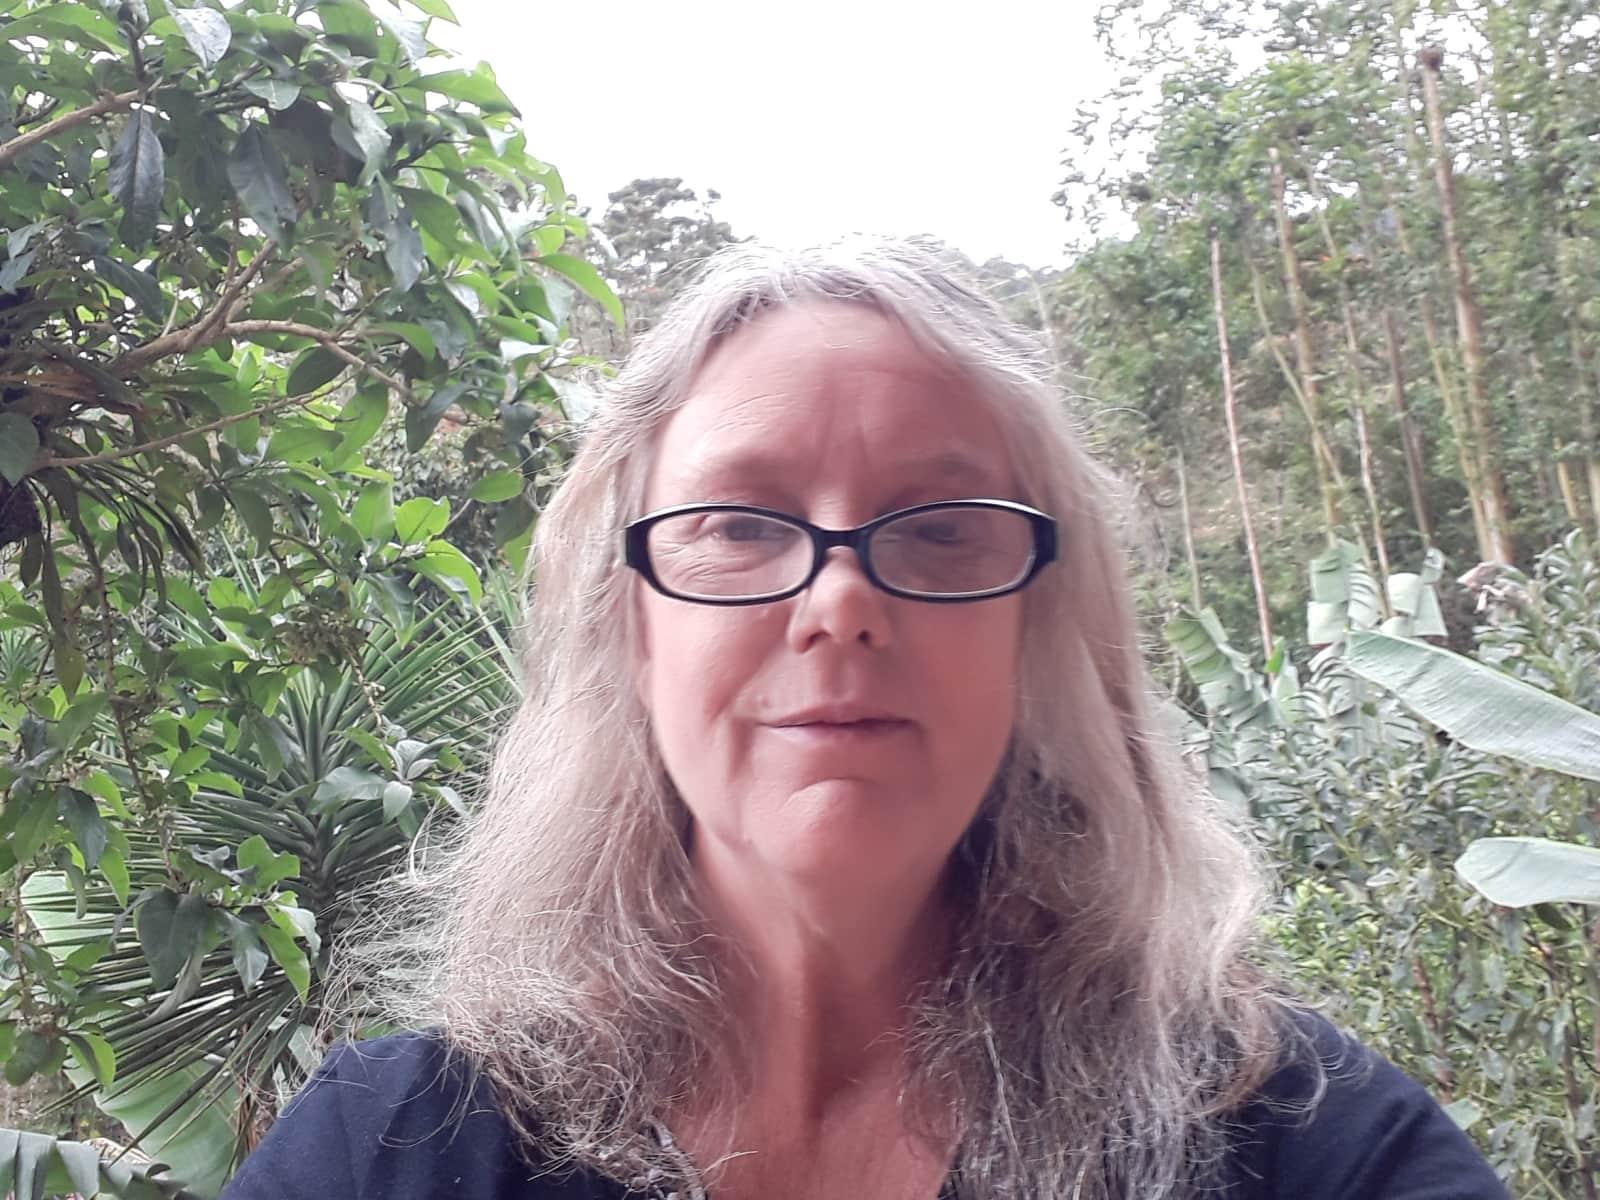 Savon from Orosí, Costa Rica